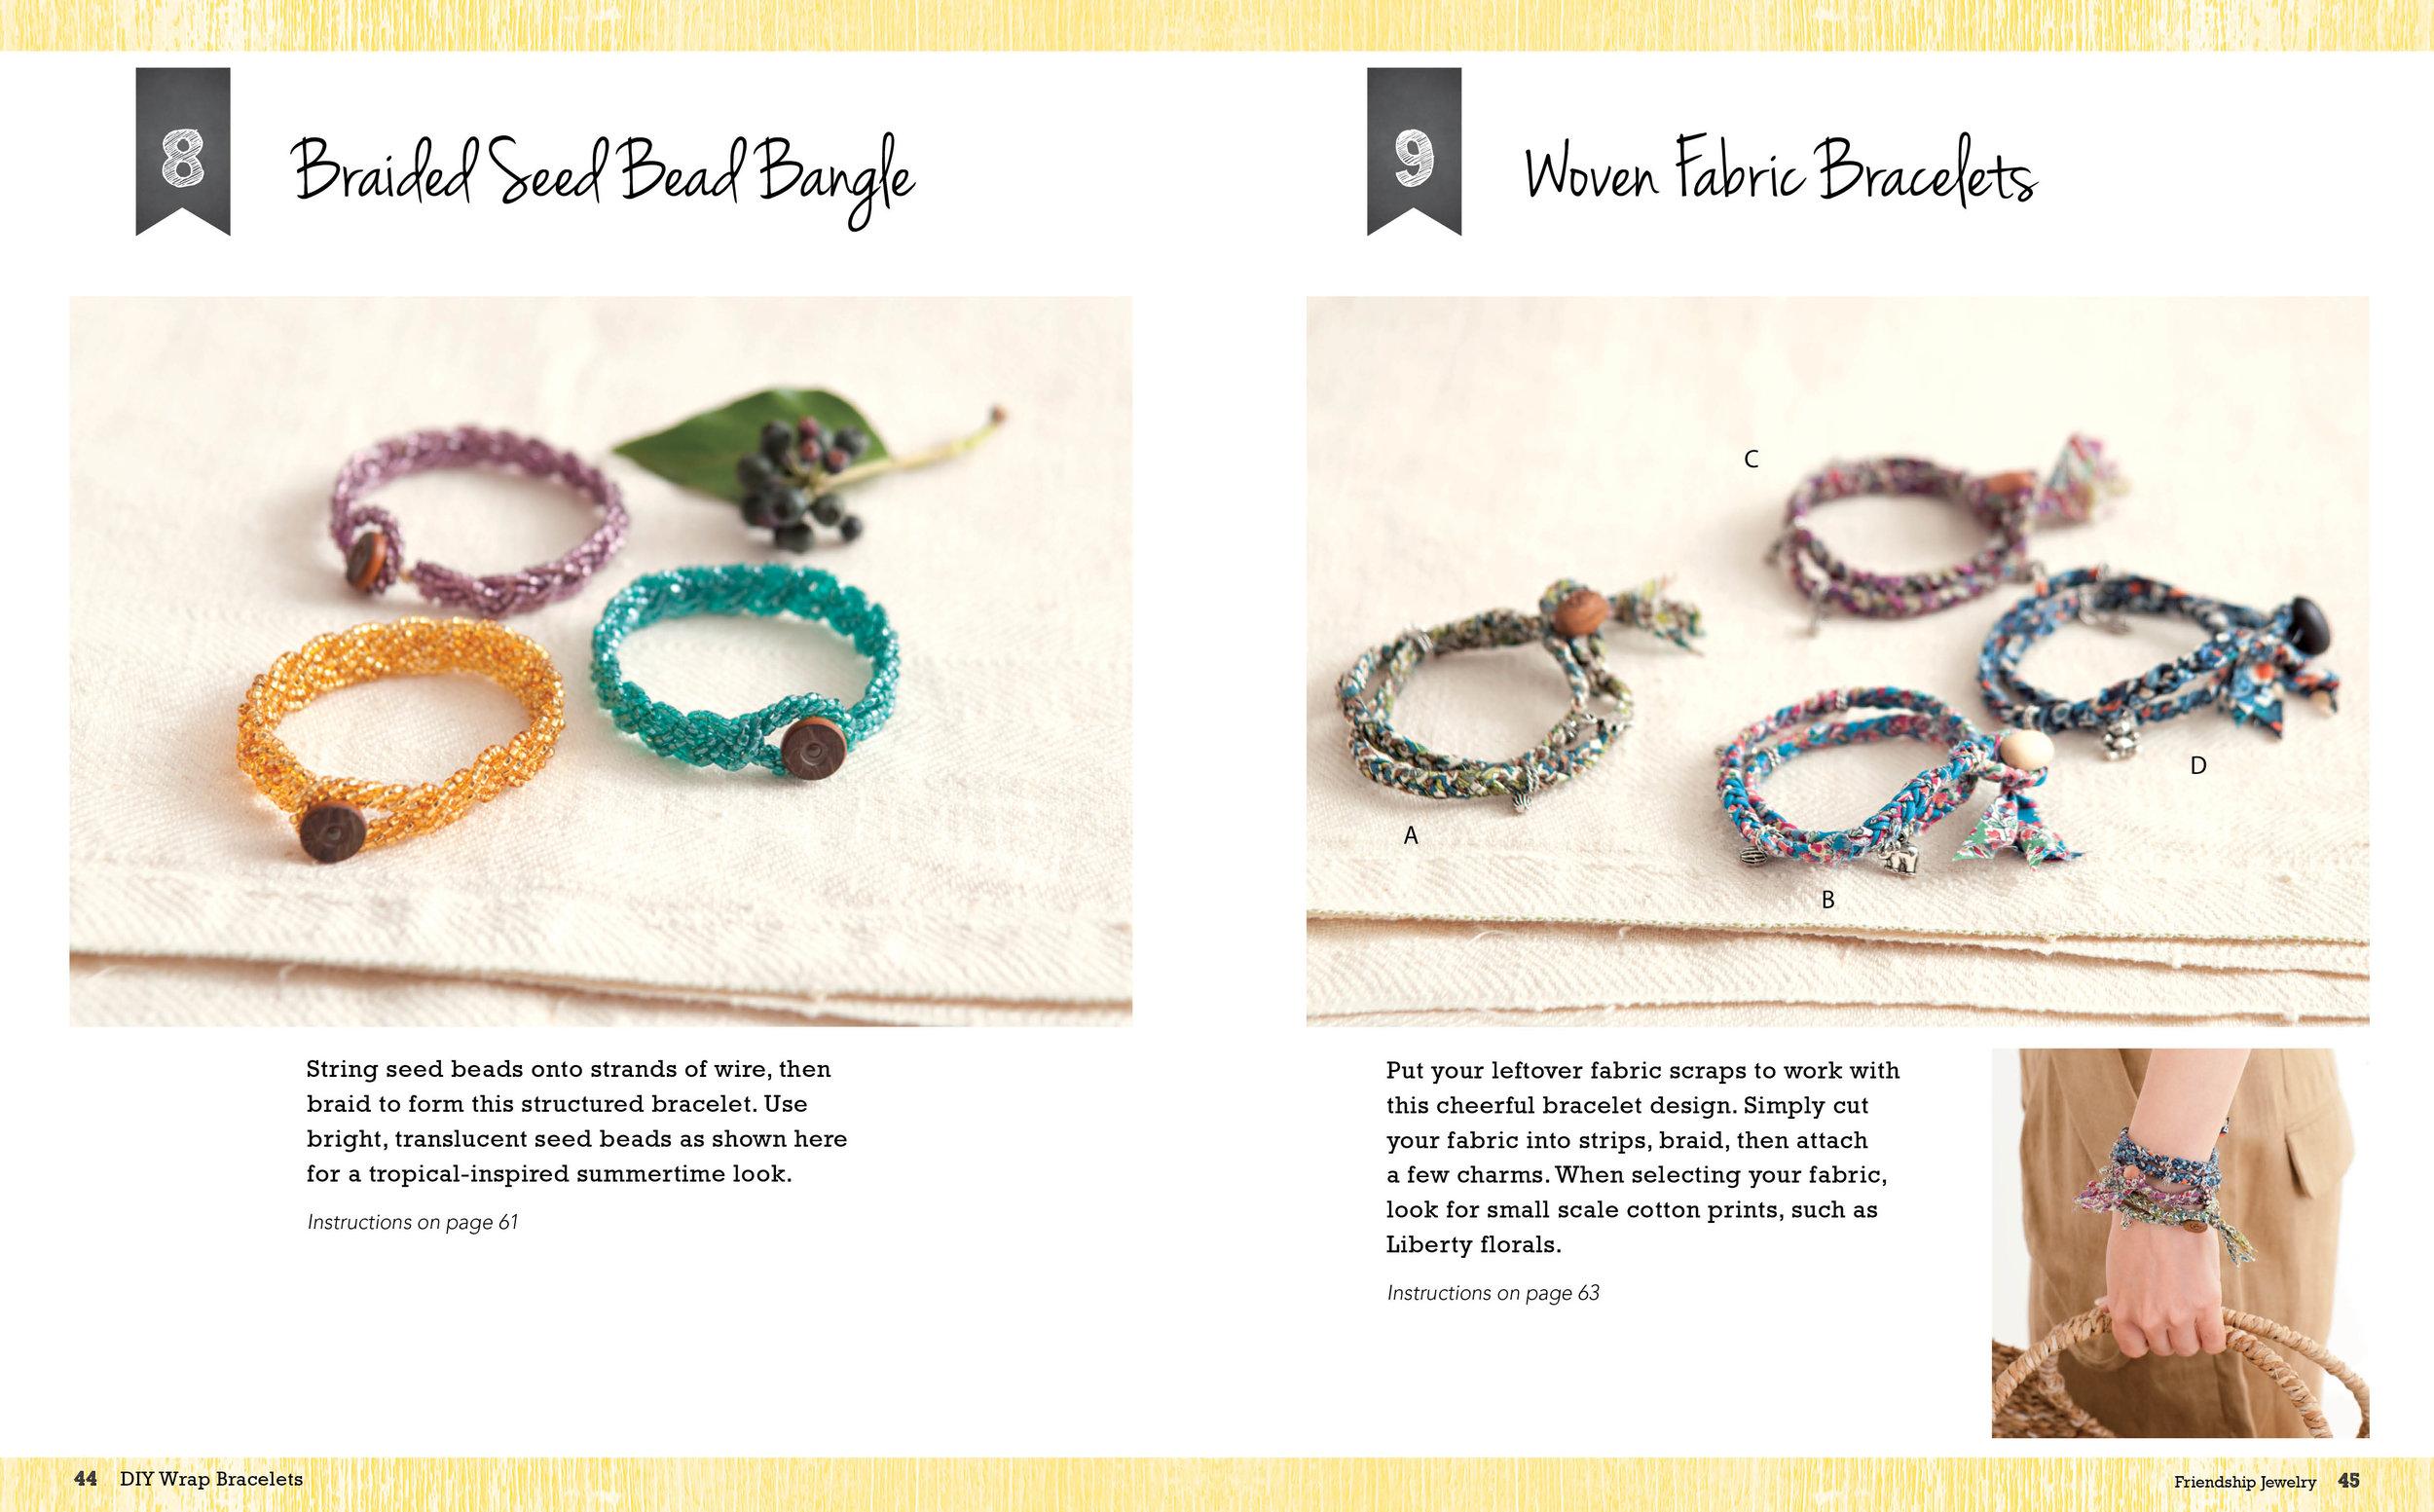 DIY Wrap Bracelets 44.45.jpg